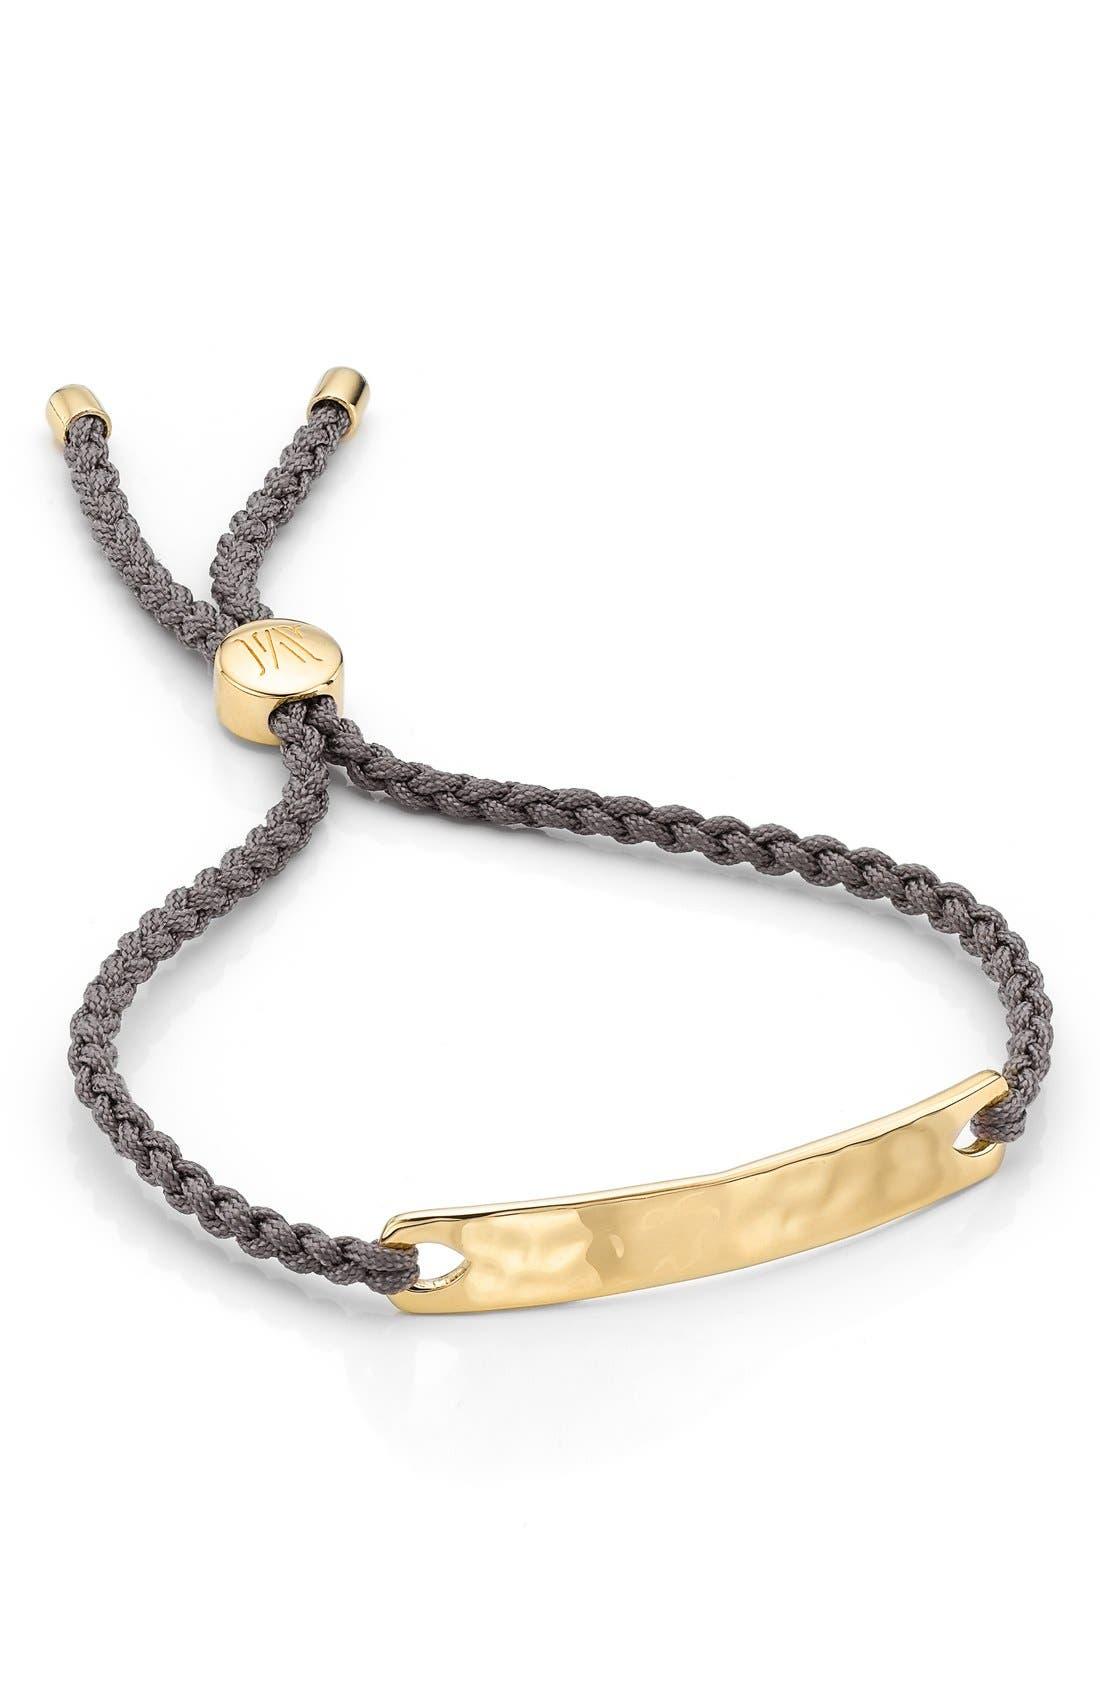 Main Image - Monica Vinader'Havana'Friendship Bracelet